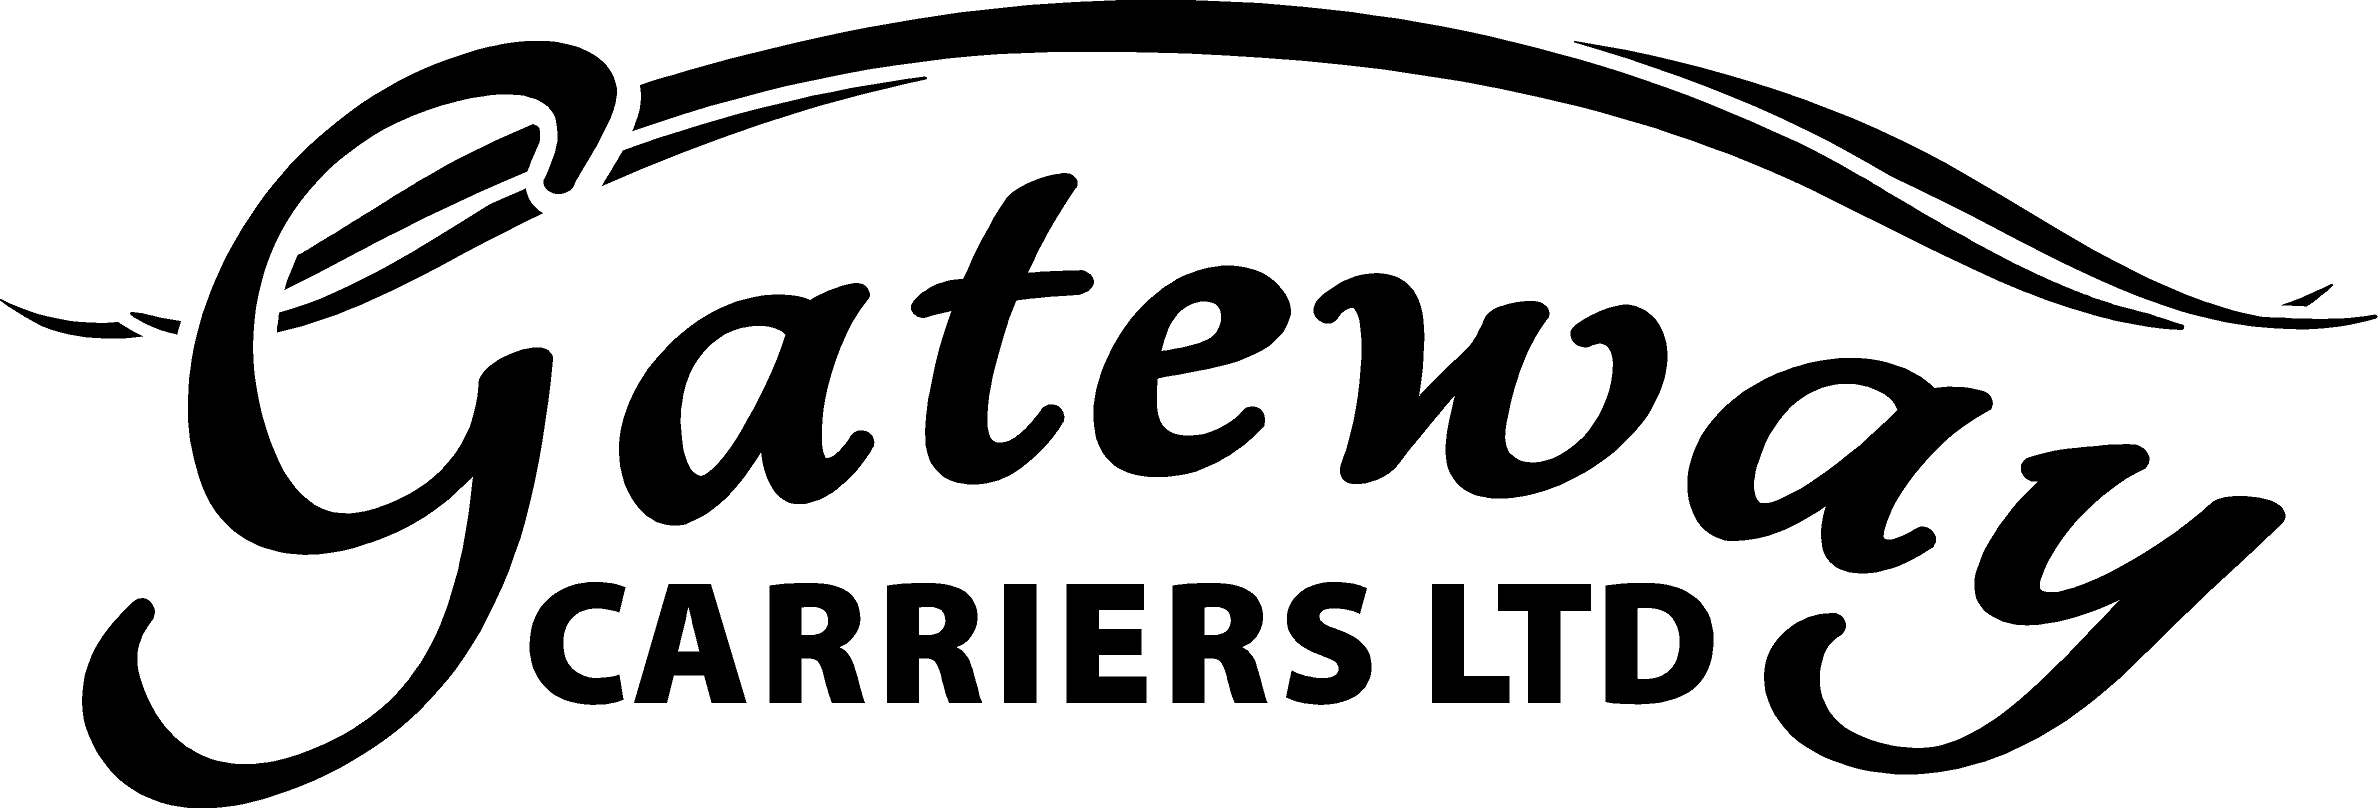 Gateway Livestock Marketing Inc. - Gateway Carriers